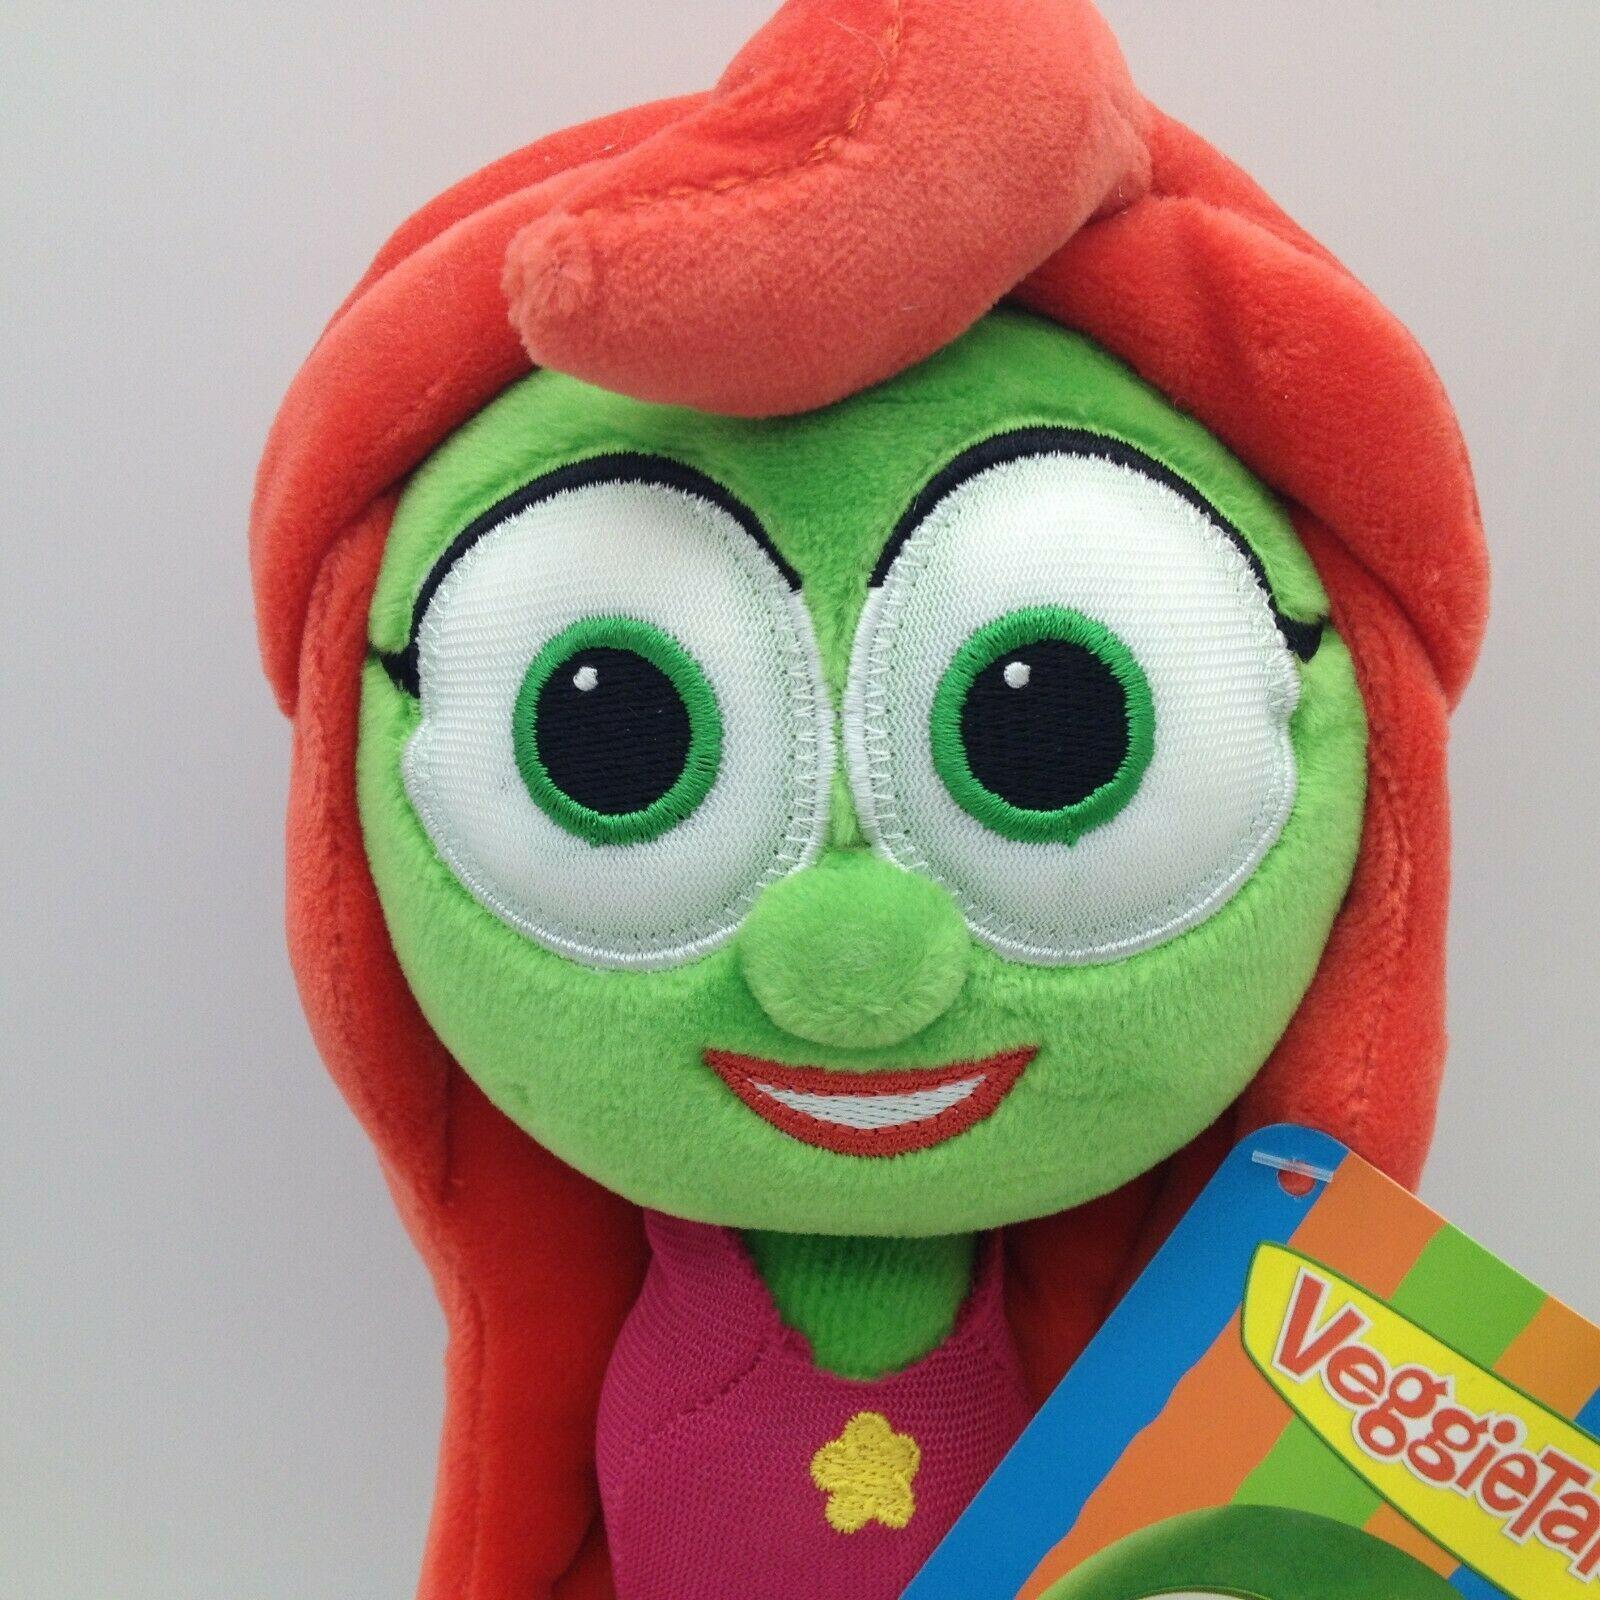 "Enesco Veggietales Petunia Rhubarb Plush Doll Toy 11"" Tall Super Soft Veggie image 4"